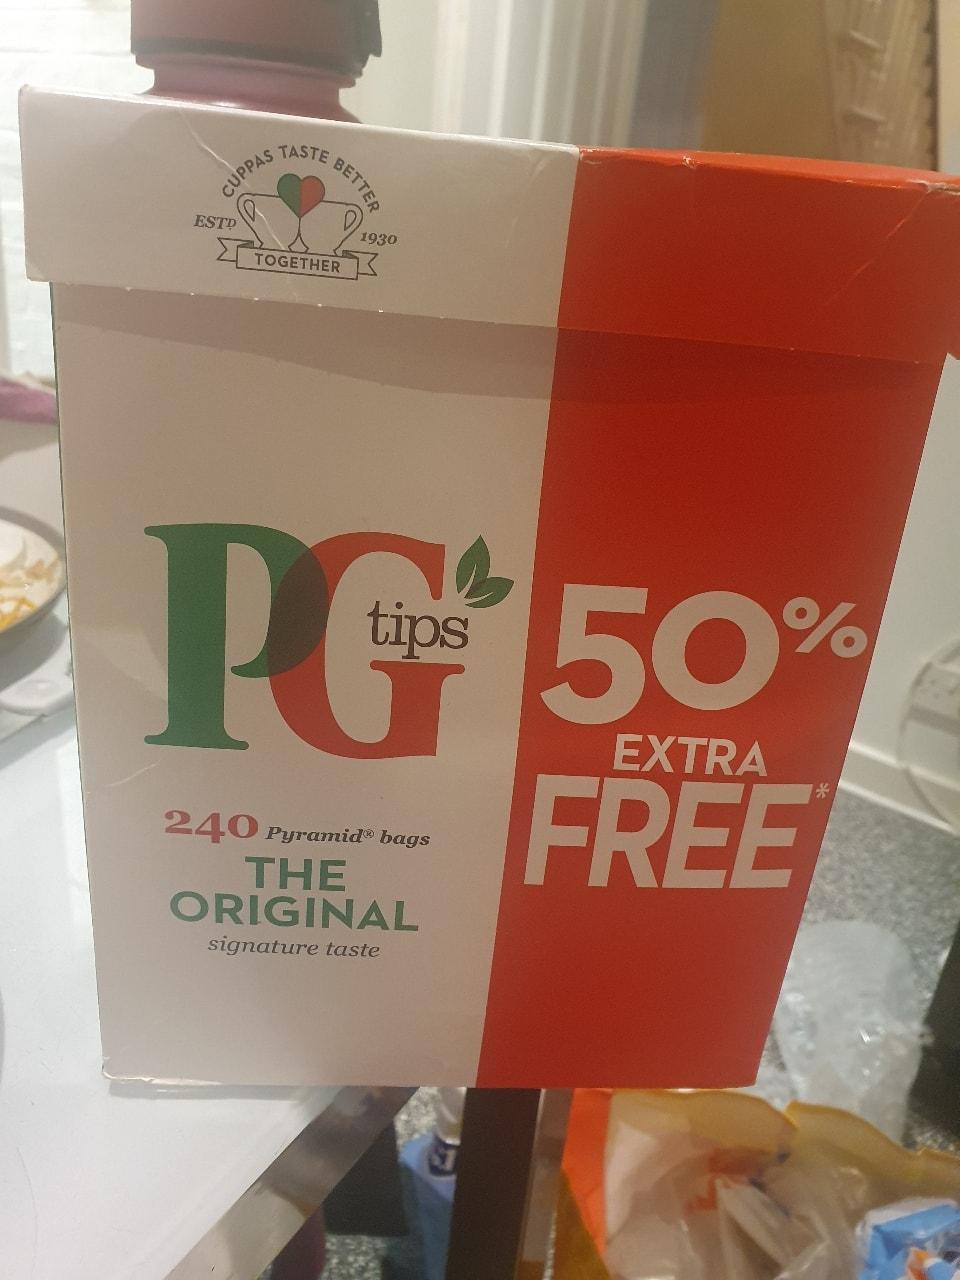 PG tips tea bags (note- past best before)